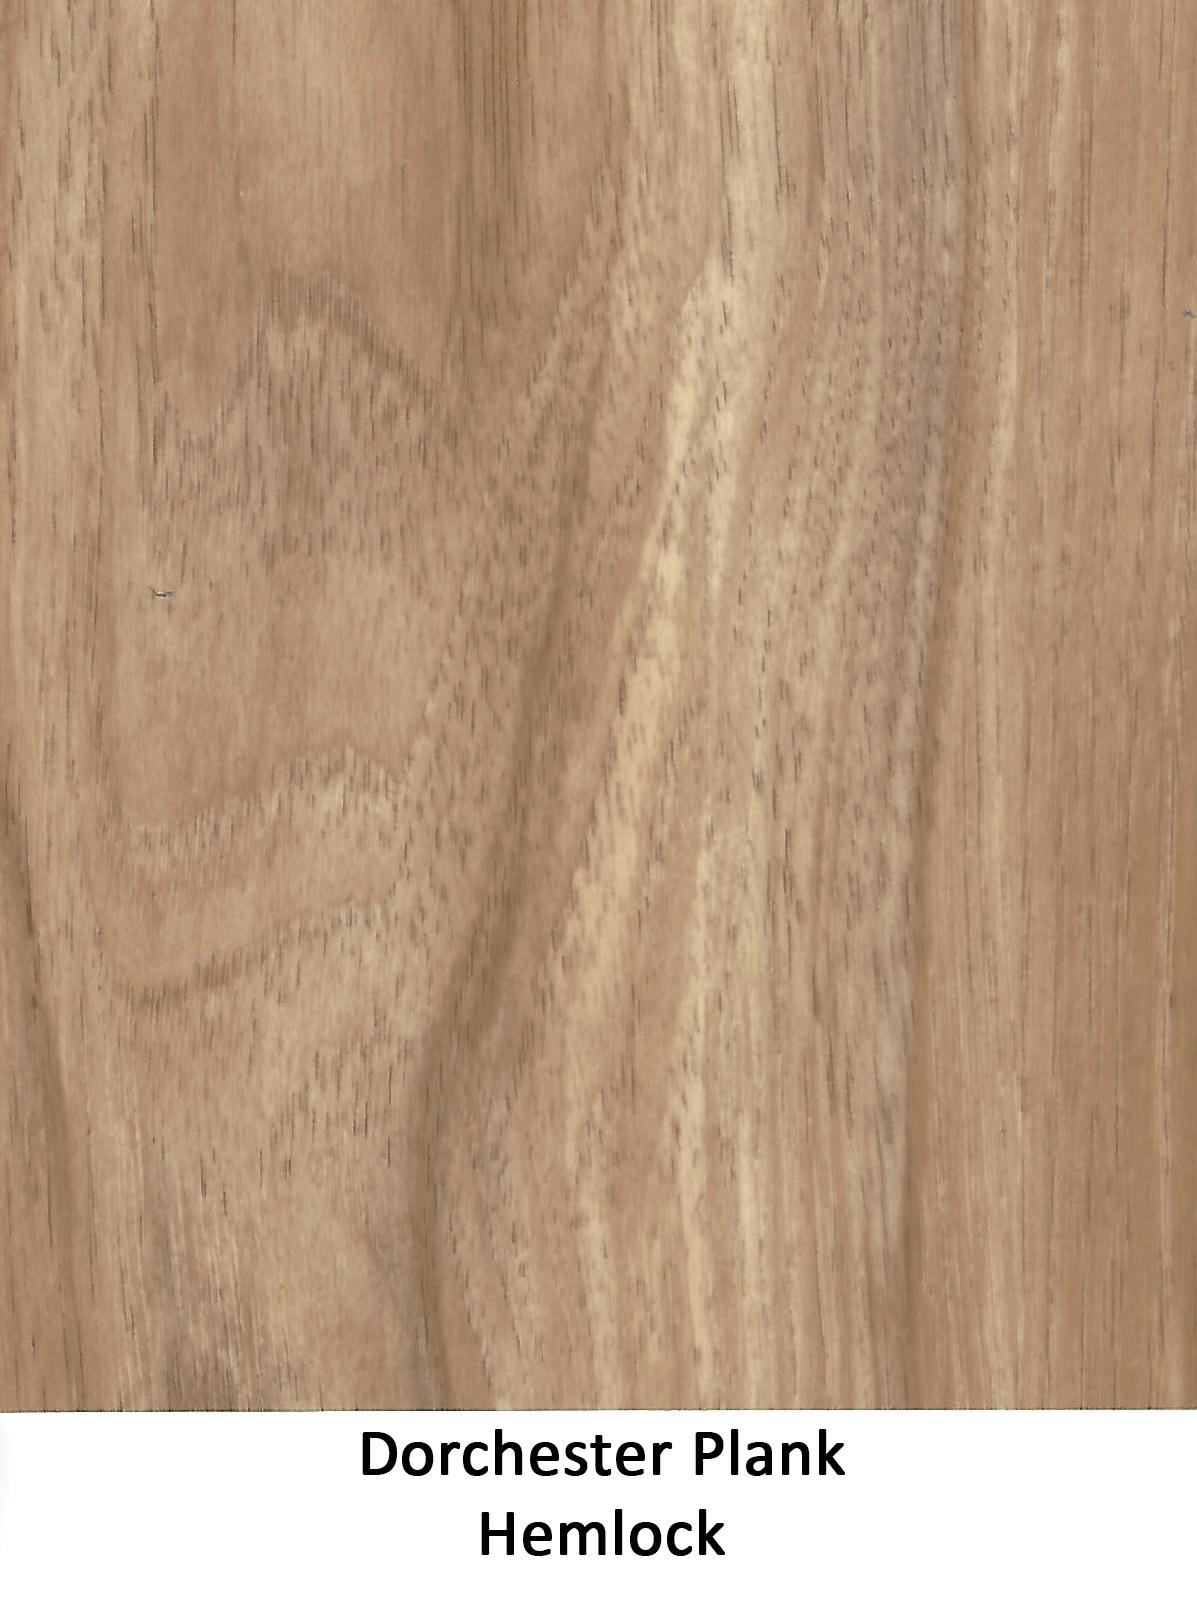 Dorchester-Plank---Hemlock.jpg